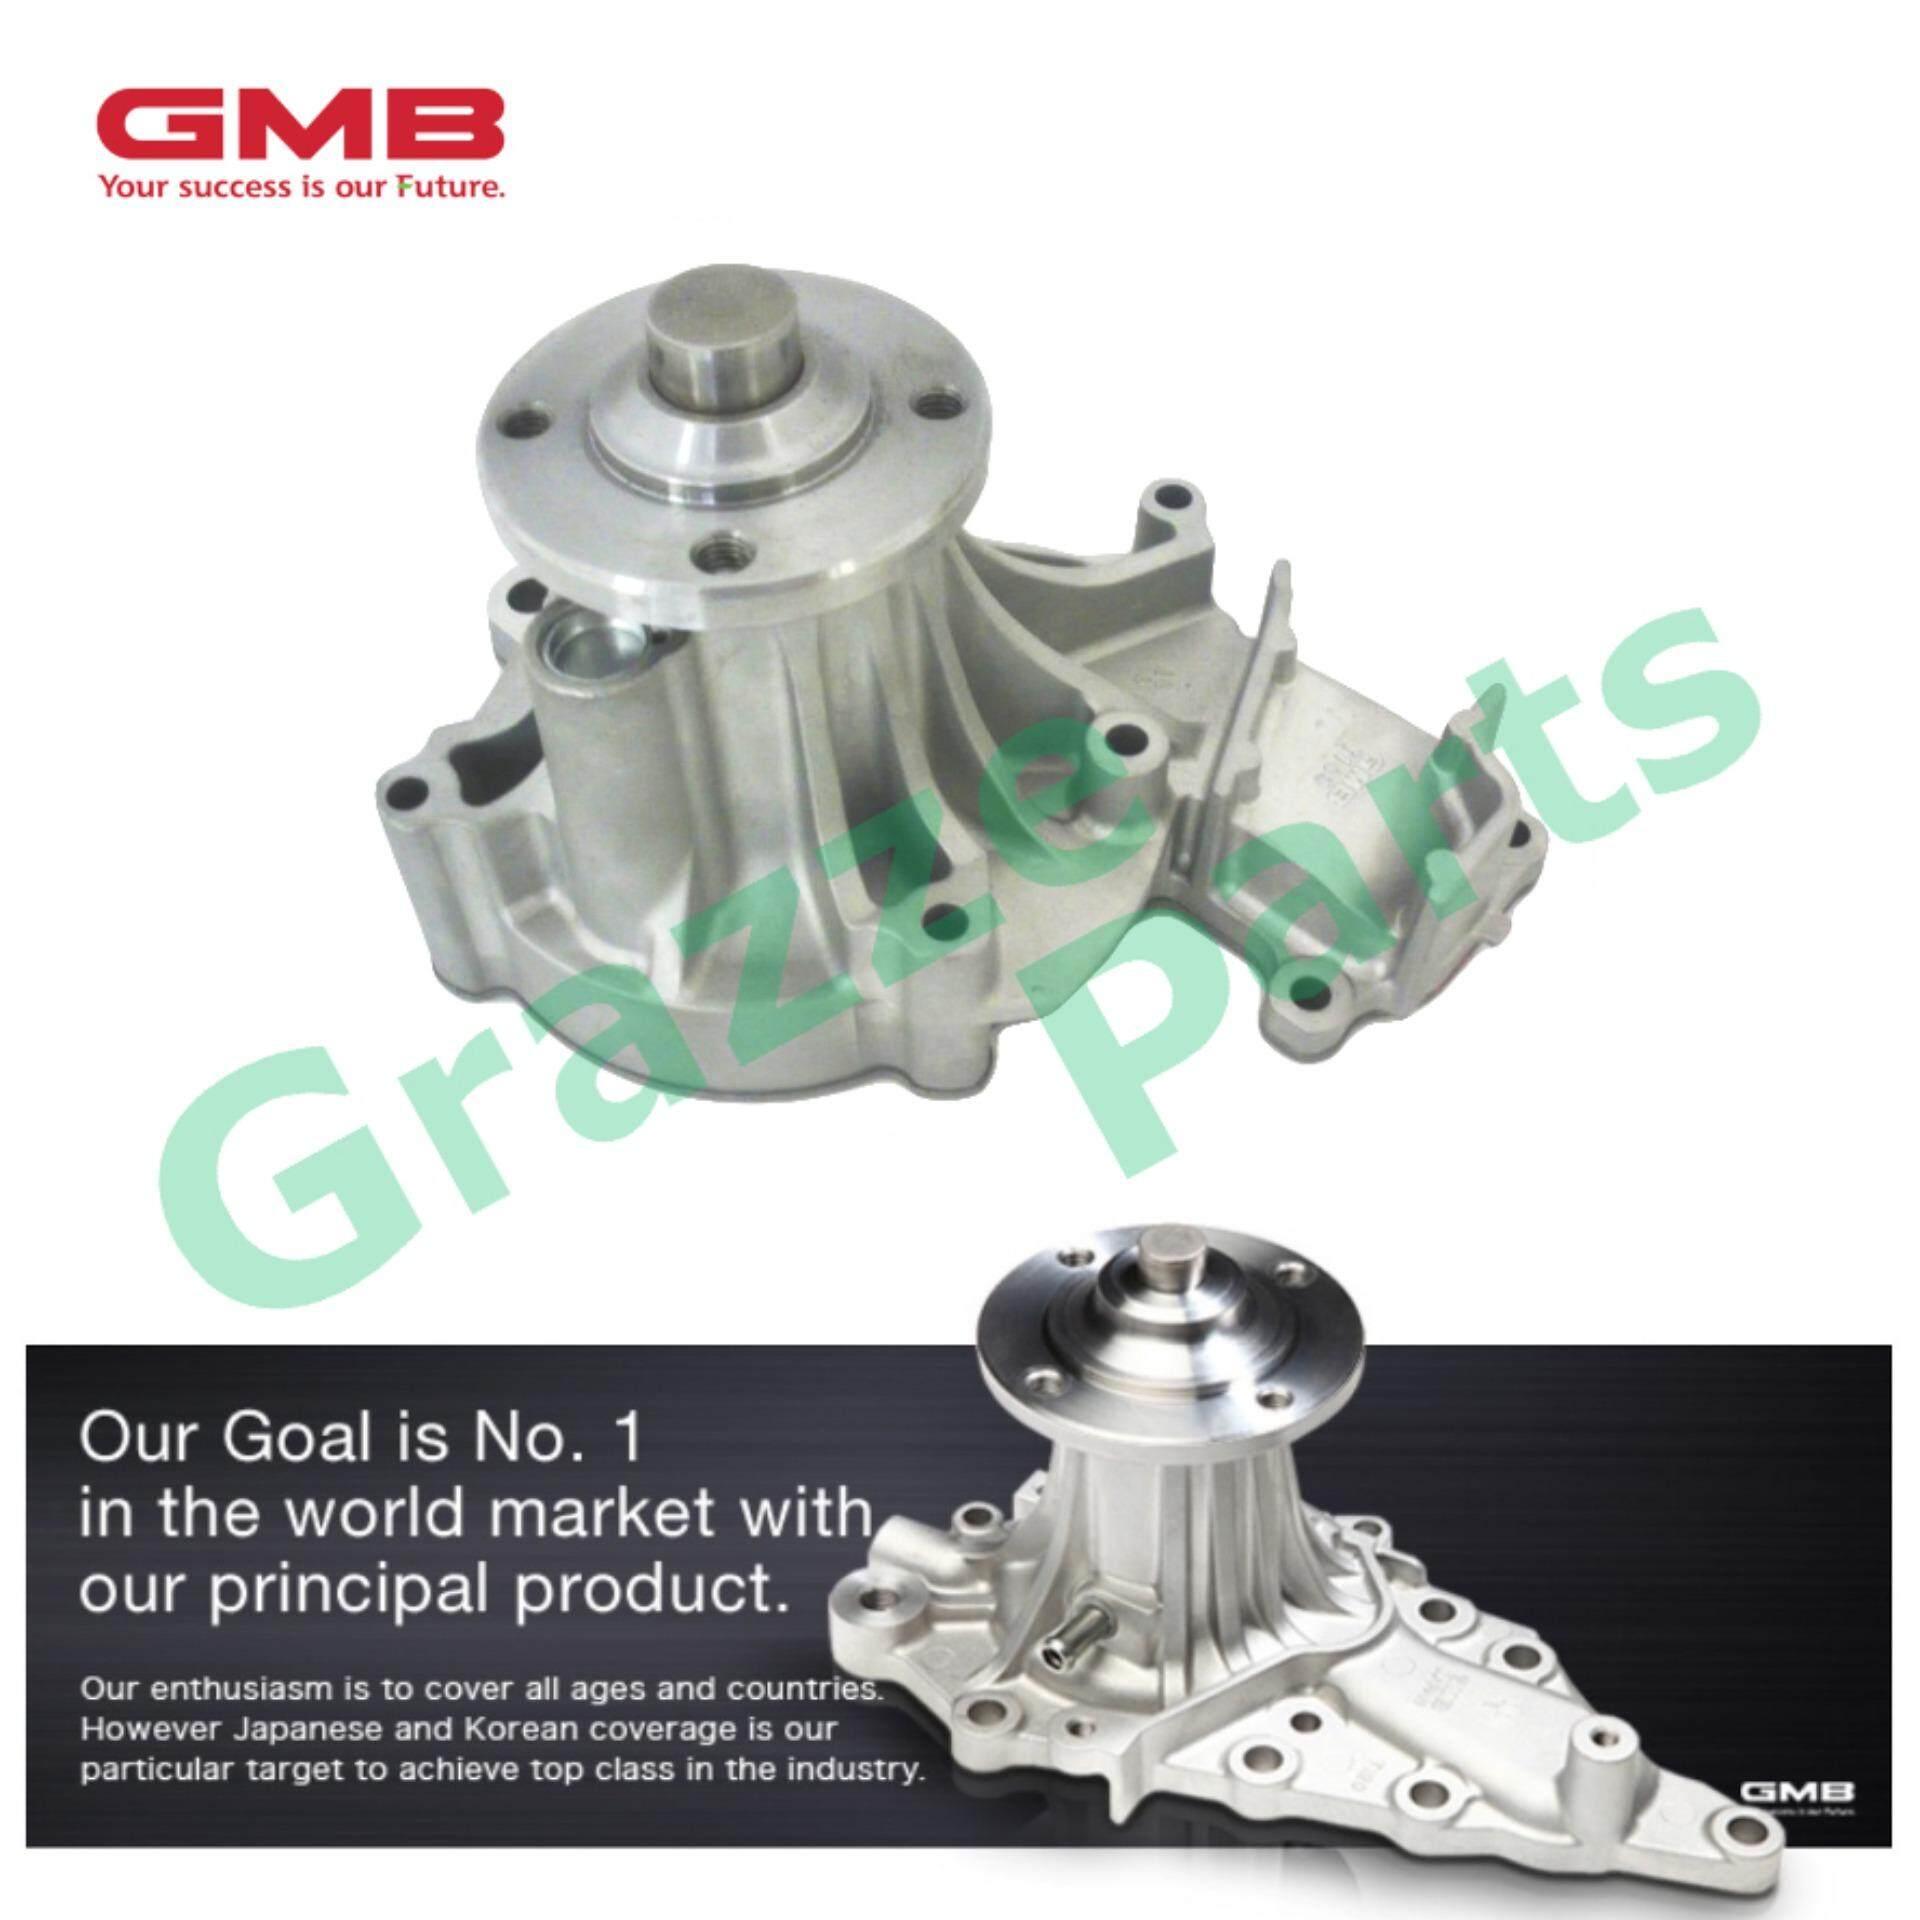 GMB Engine Water Pump GWT-150A for Toyota Hilux KUN25 Prado 1KZ